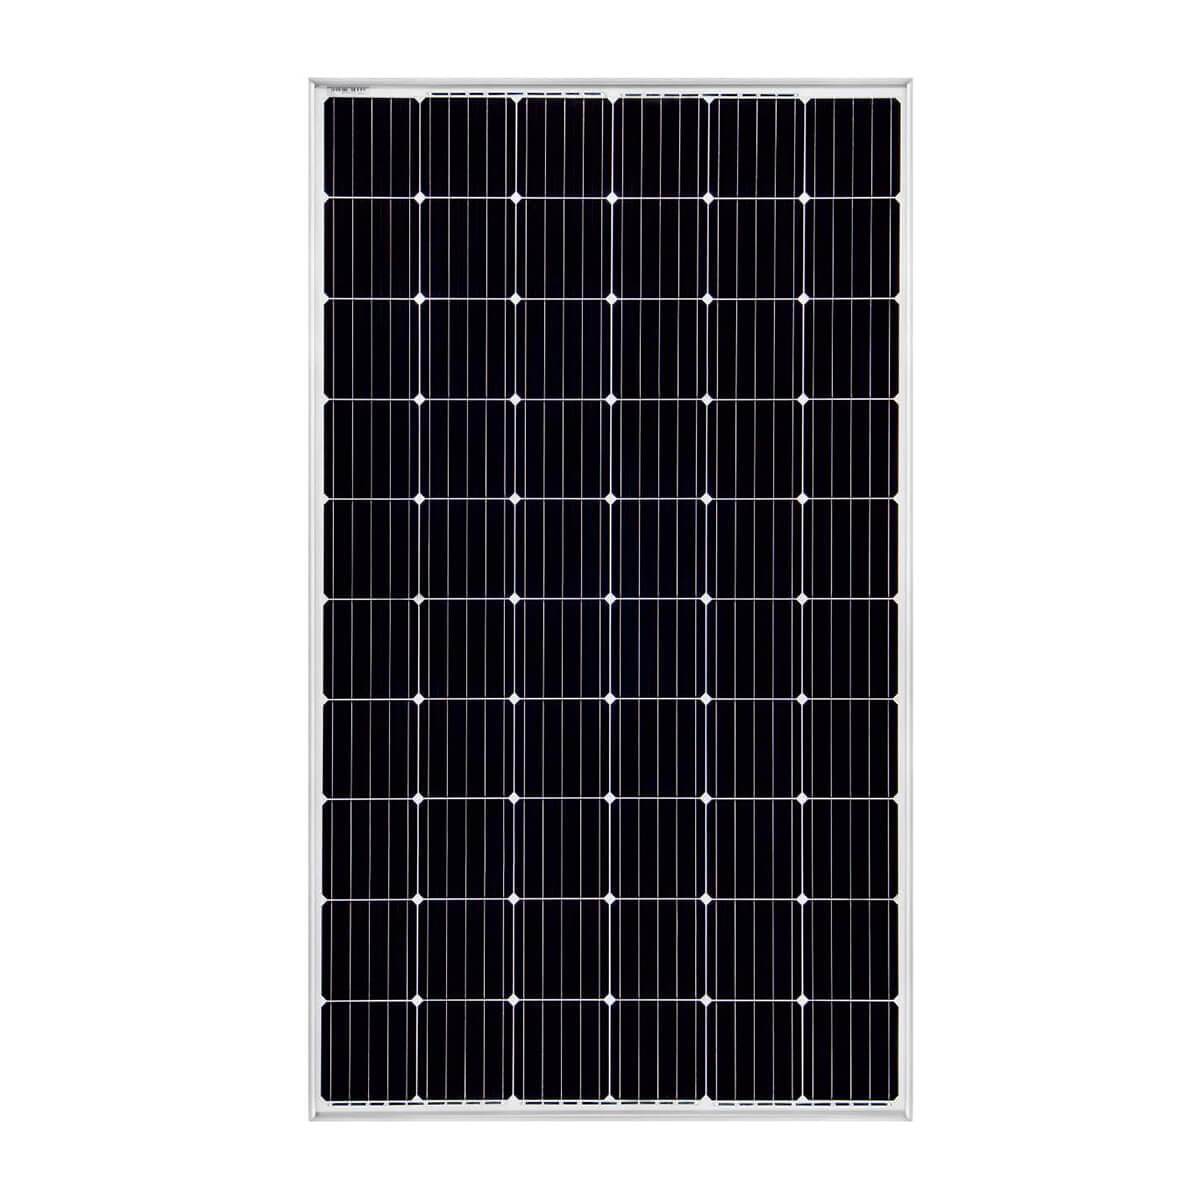 Odul solar 330W panel, odul solar 330Watt panel, Odul solar 330 W panel, odul solar 330 Watt panel, odul solar 330 Watt monokristal panel, Odul solar 330 W watt gunes paneli, odul solar 330 W watt monokristal gunes paneli, odul solar 330 W Watt fotovoltaik monokristal solar panel, odul solar 330W monokristal gunes enerjisi, odul solar OSMp60-330W panel, ÖDÜL SOLAR 330 WATT